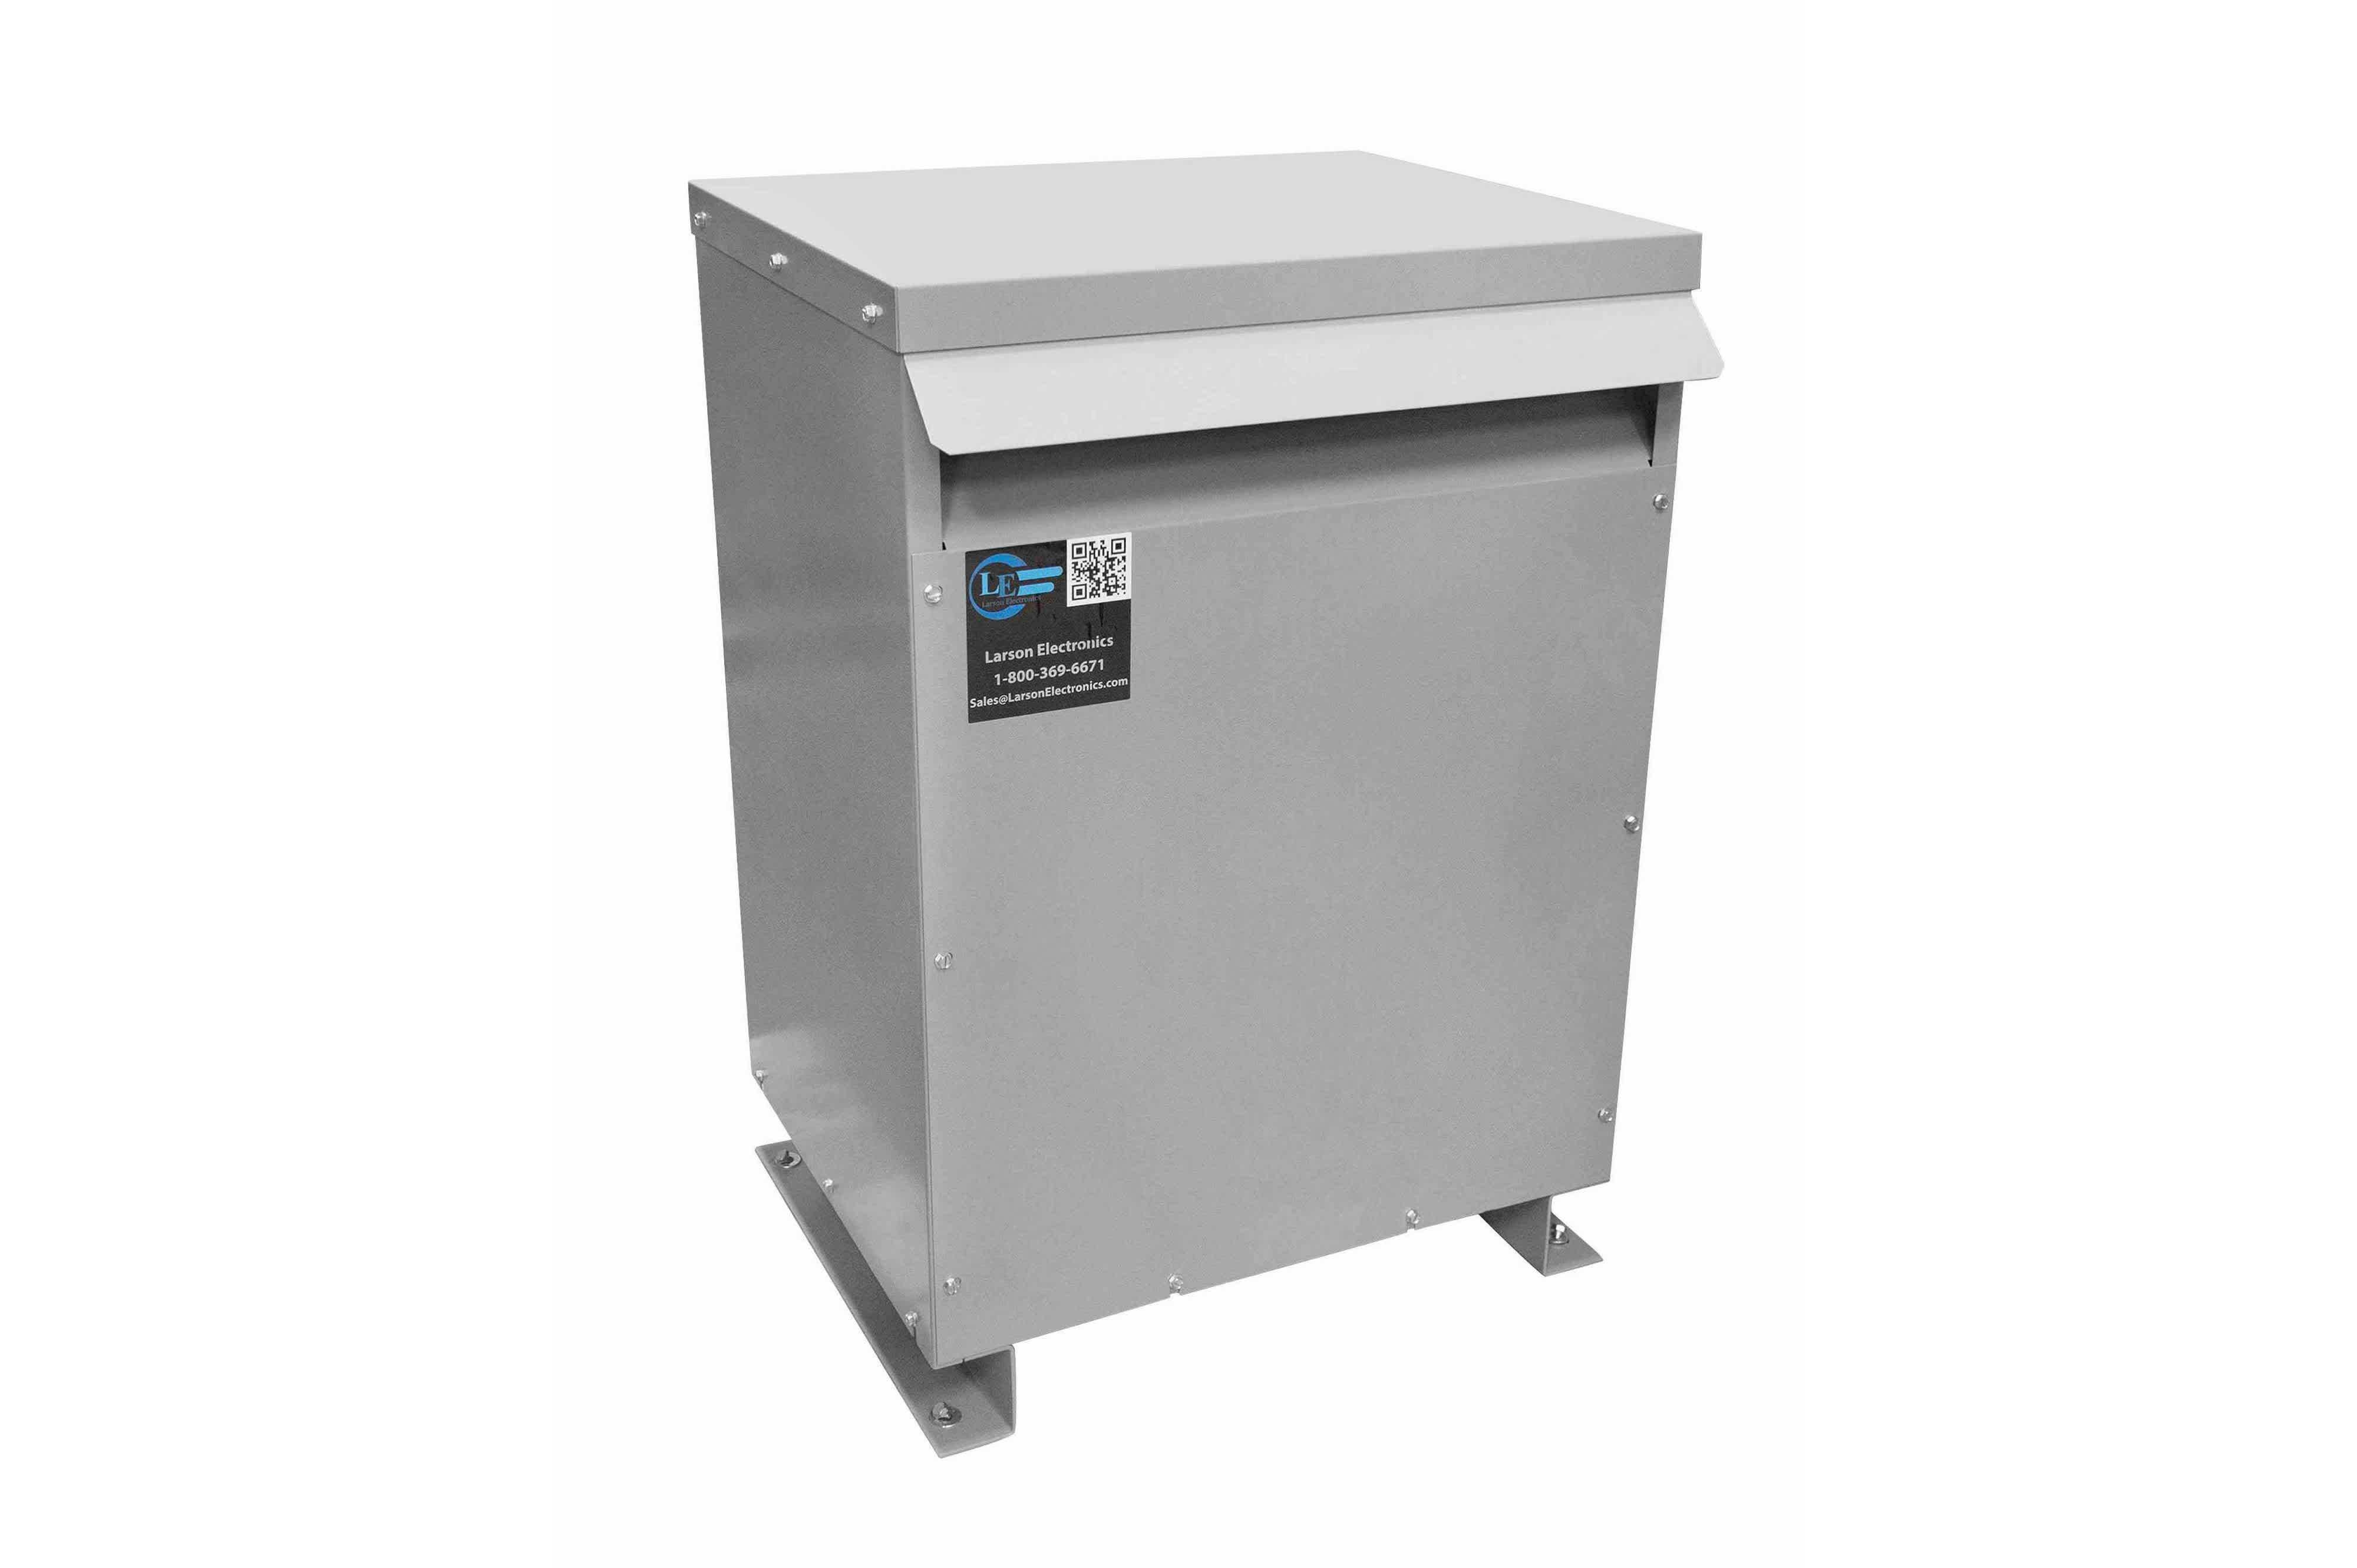 110 kVA 3PH Isolation Transformer, 400V Wye Primary, 240V/120 Delta Secondary, N3R, Ventilated, 60 Hz